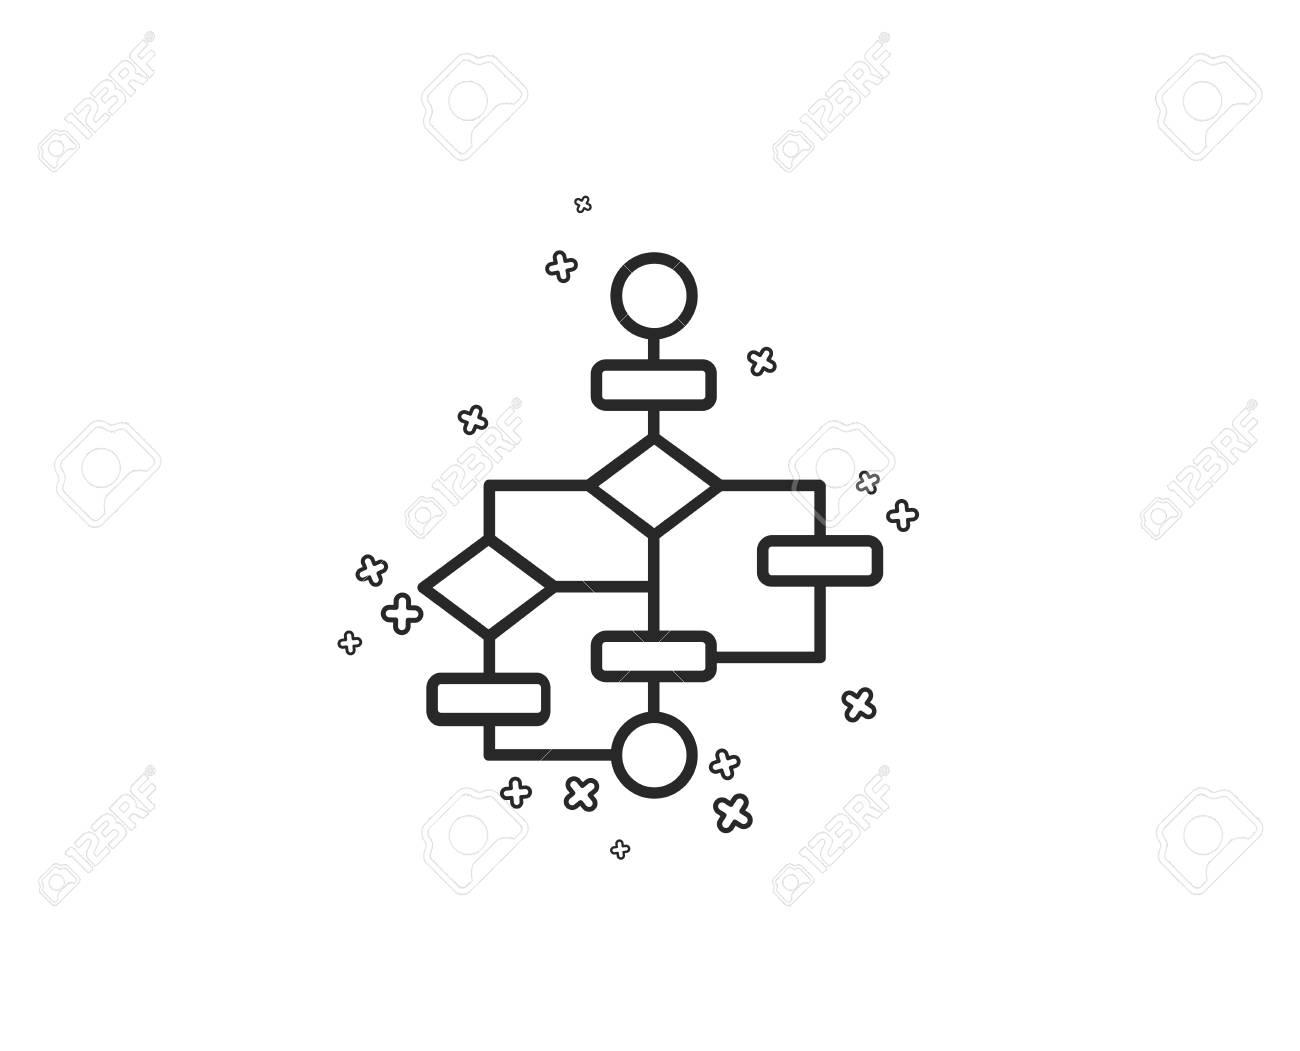 hight resolution of block diagram line icon path scheme sign algorithm symbol geometric shapes random